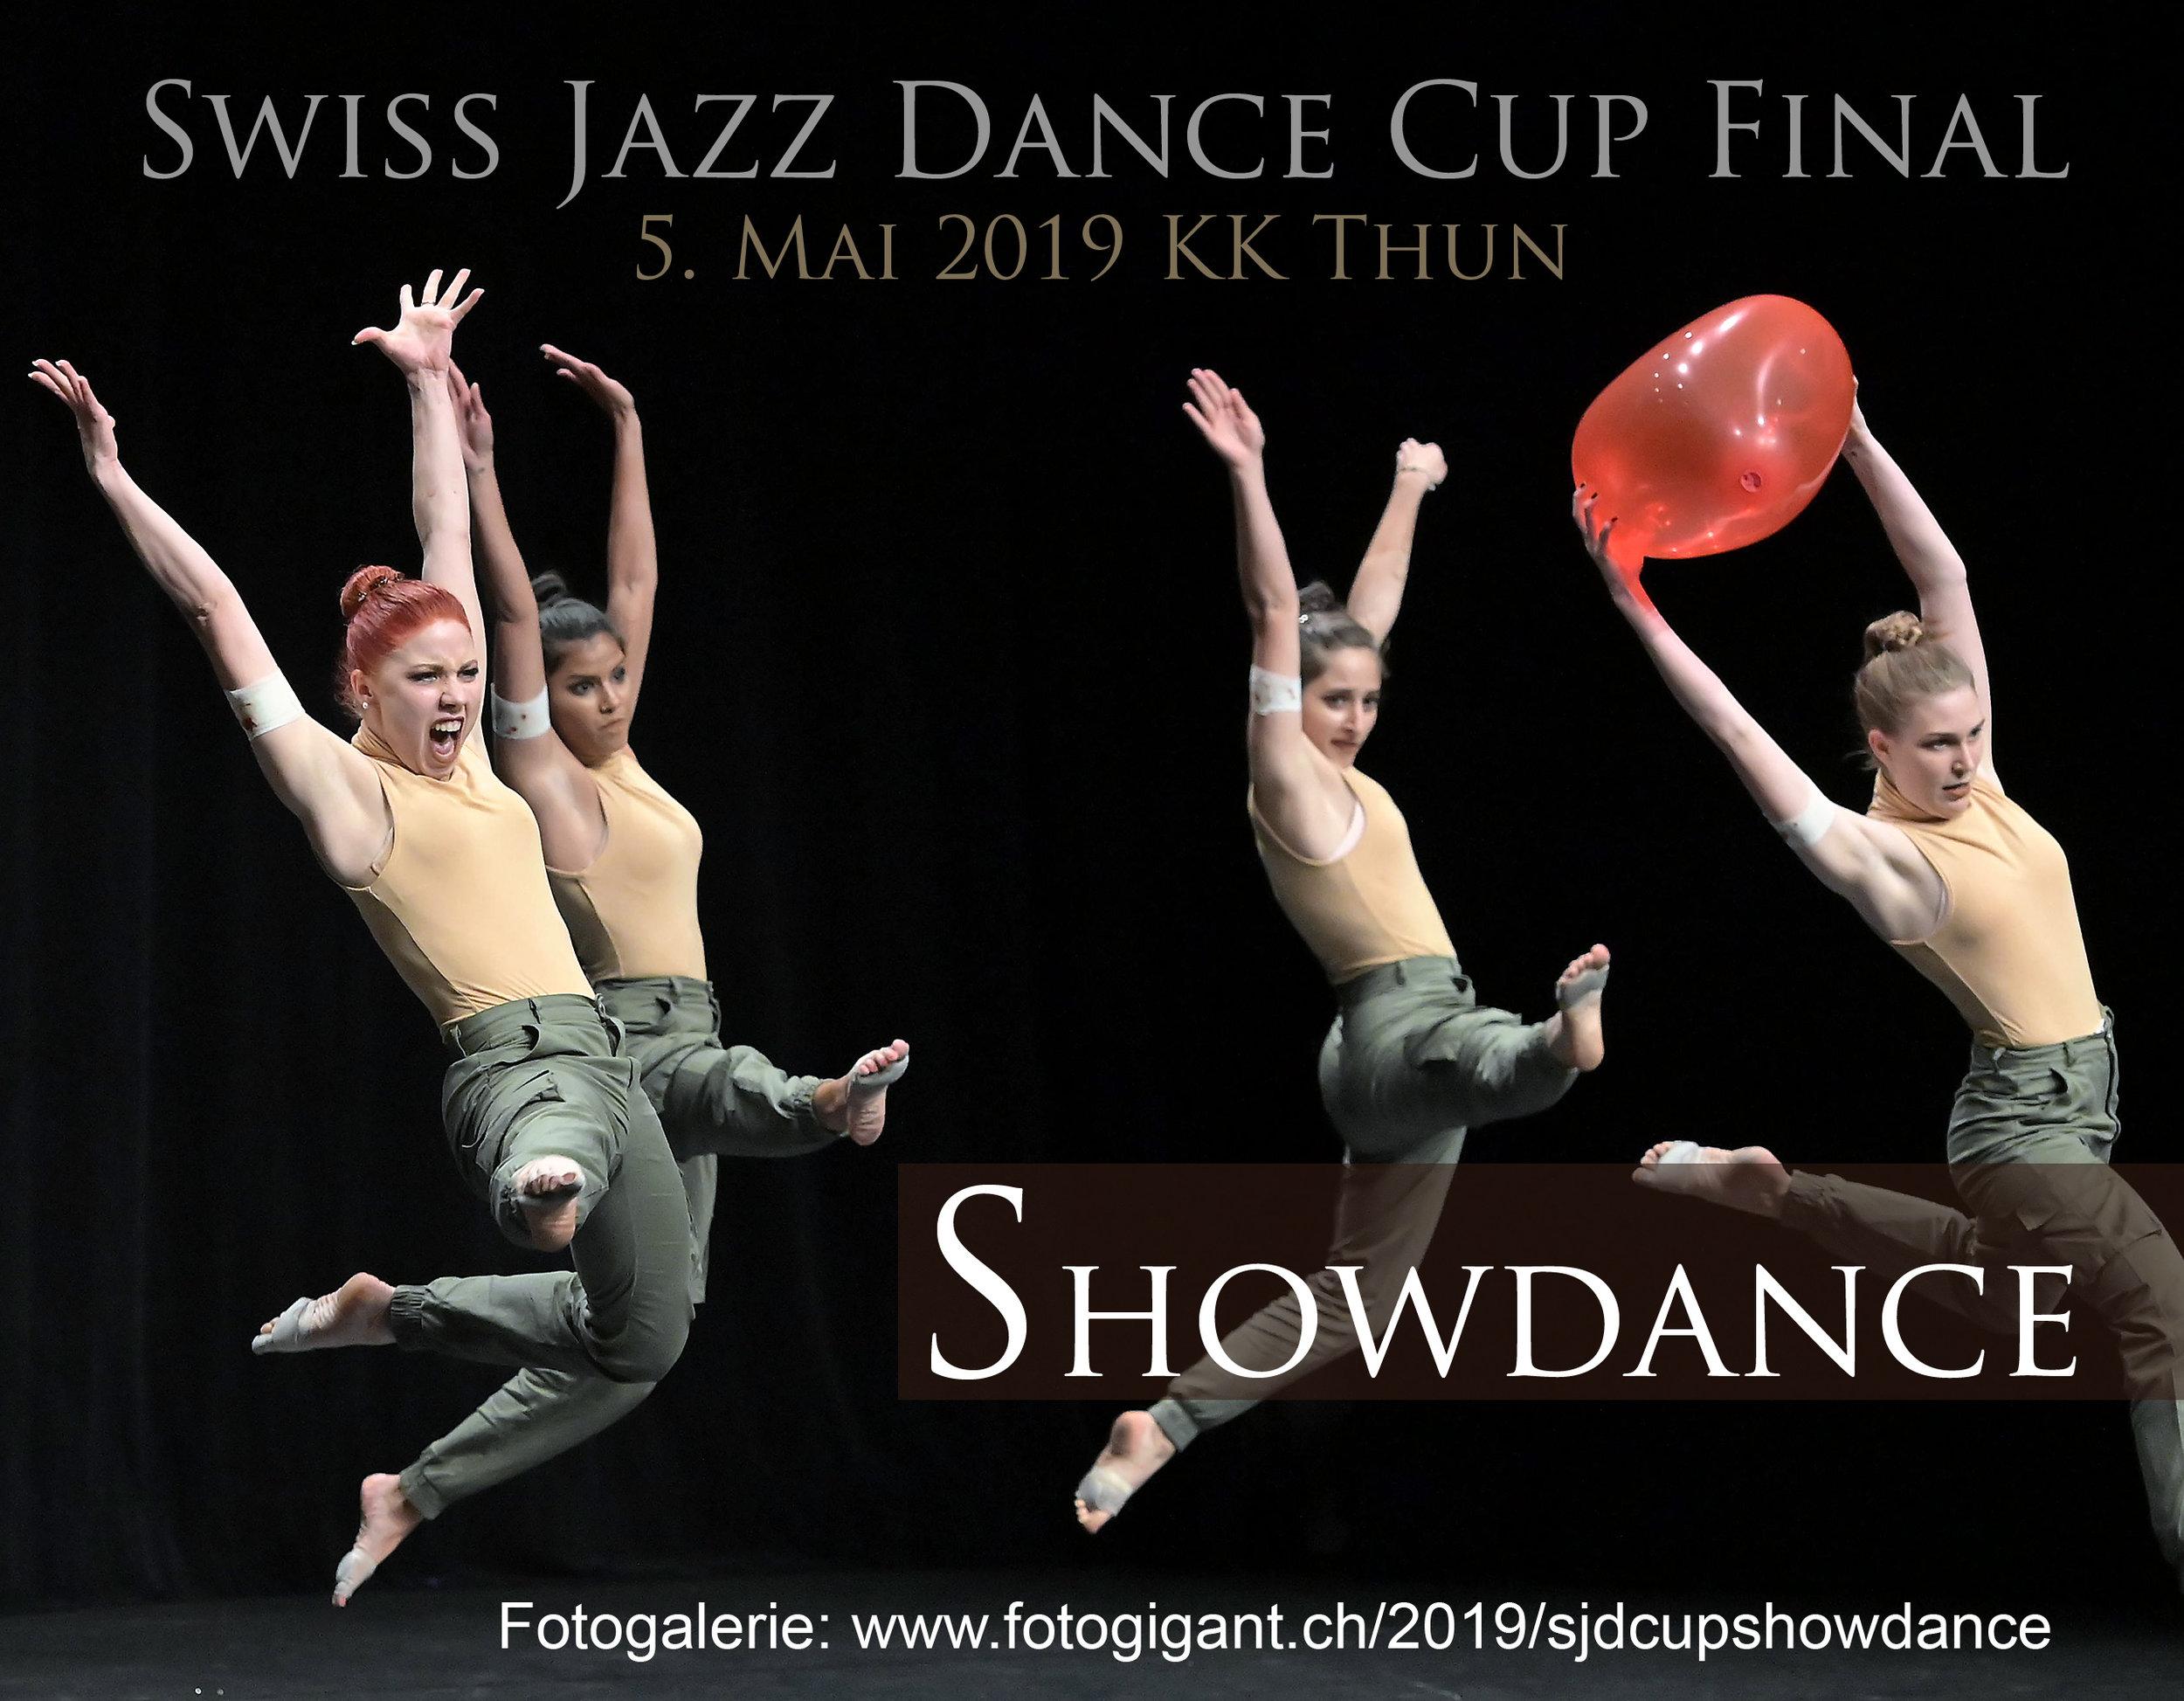 www.fotogigant.ch/2019/sjdcupshowdance